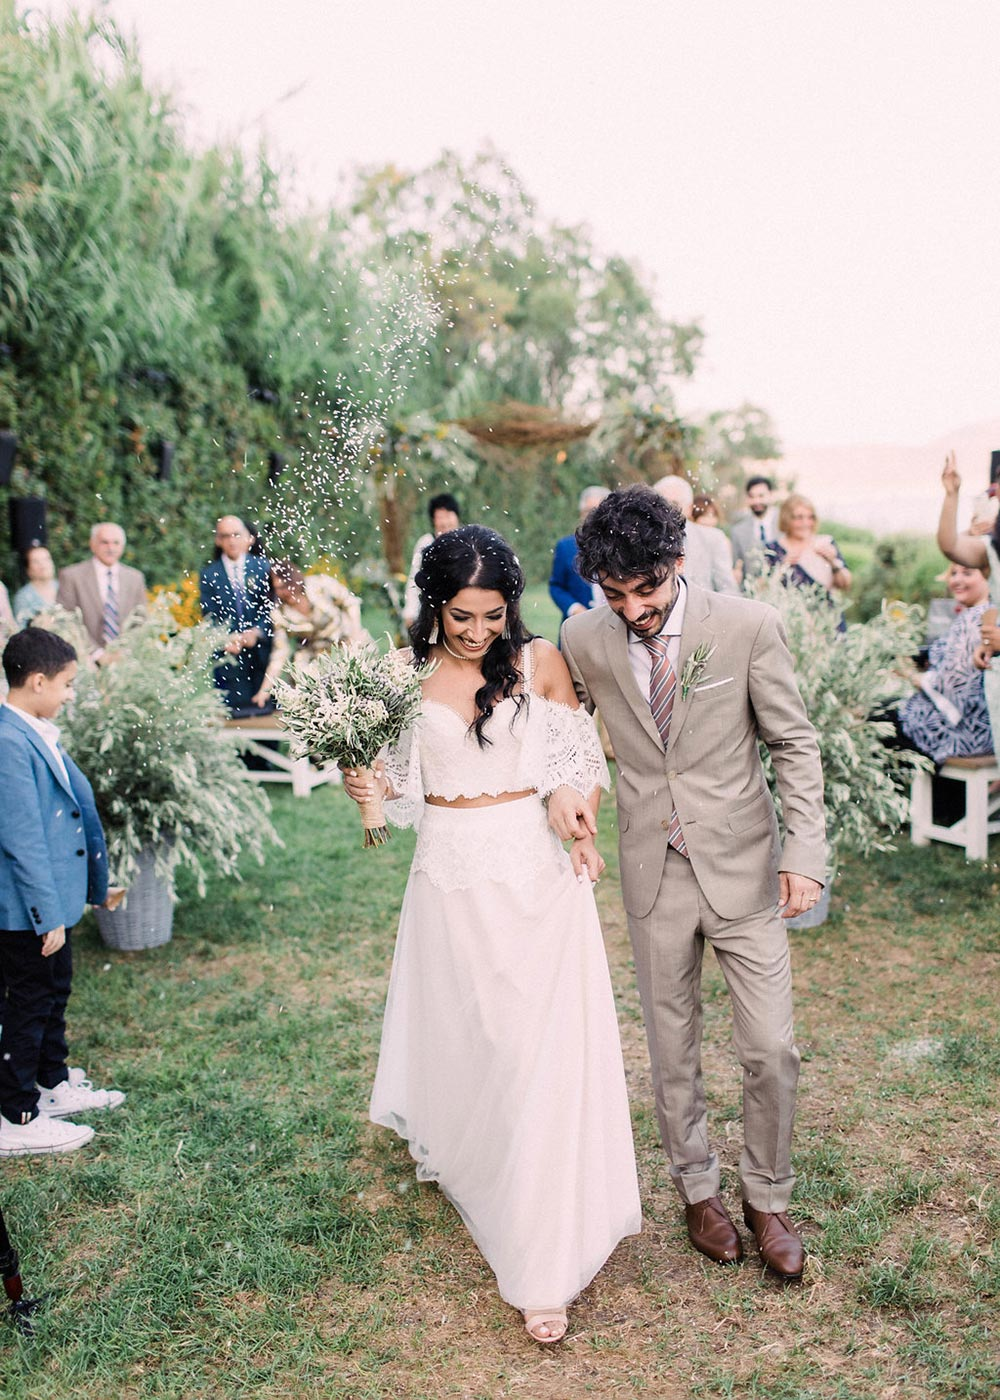 boho off-the-shoulder wedding dress and tan groom suit destination wedding